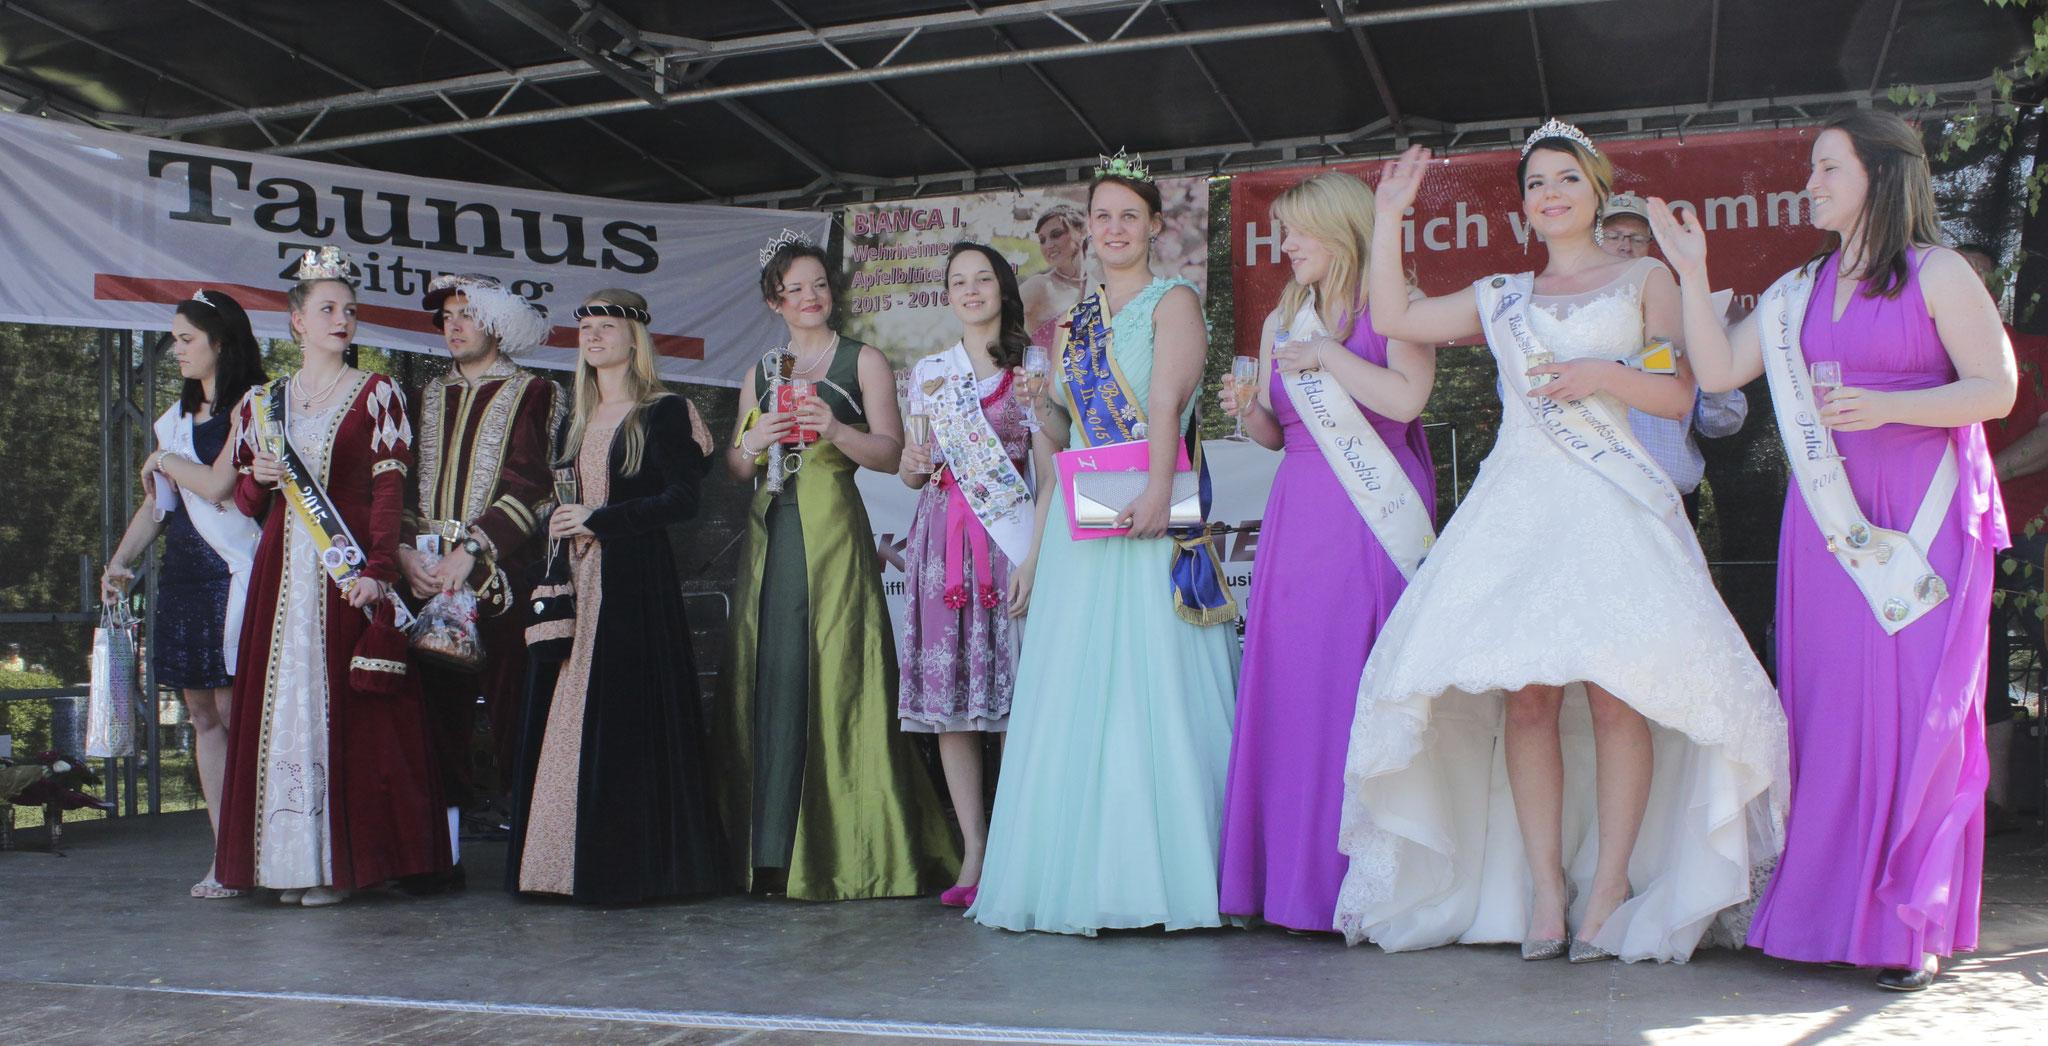 Apfelblütenkönigin Jenny I., Wehrheim, Apfeldorf, Taunus, Foto: Ursula Konder